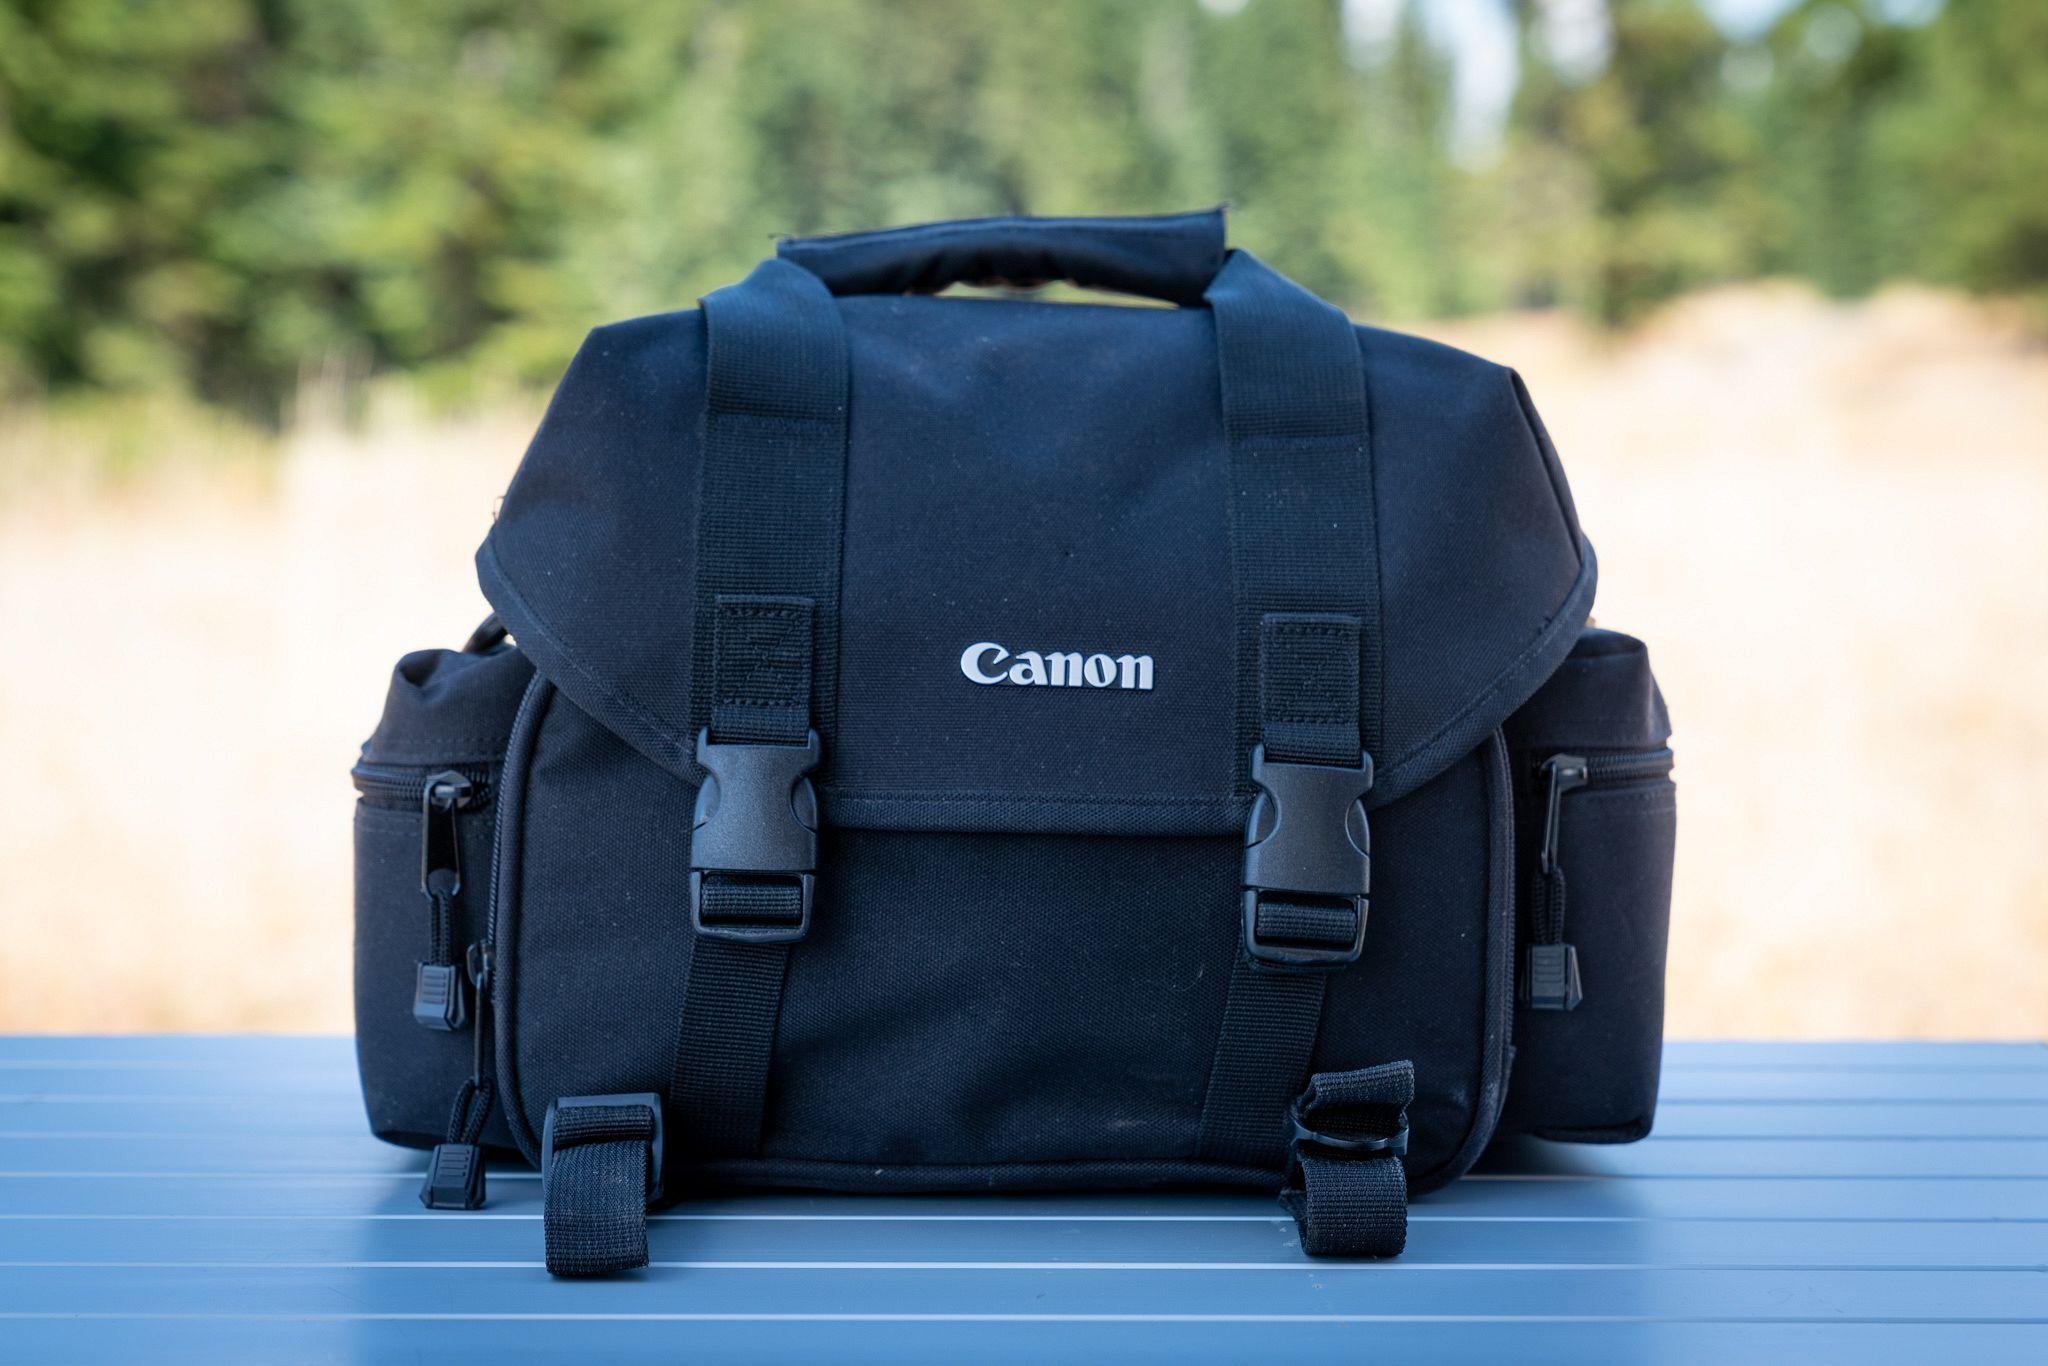 Canon 2400 SLR Gadget Bag